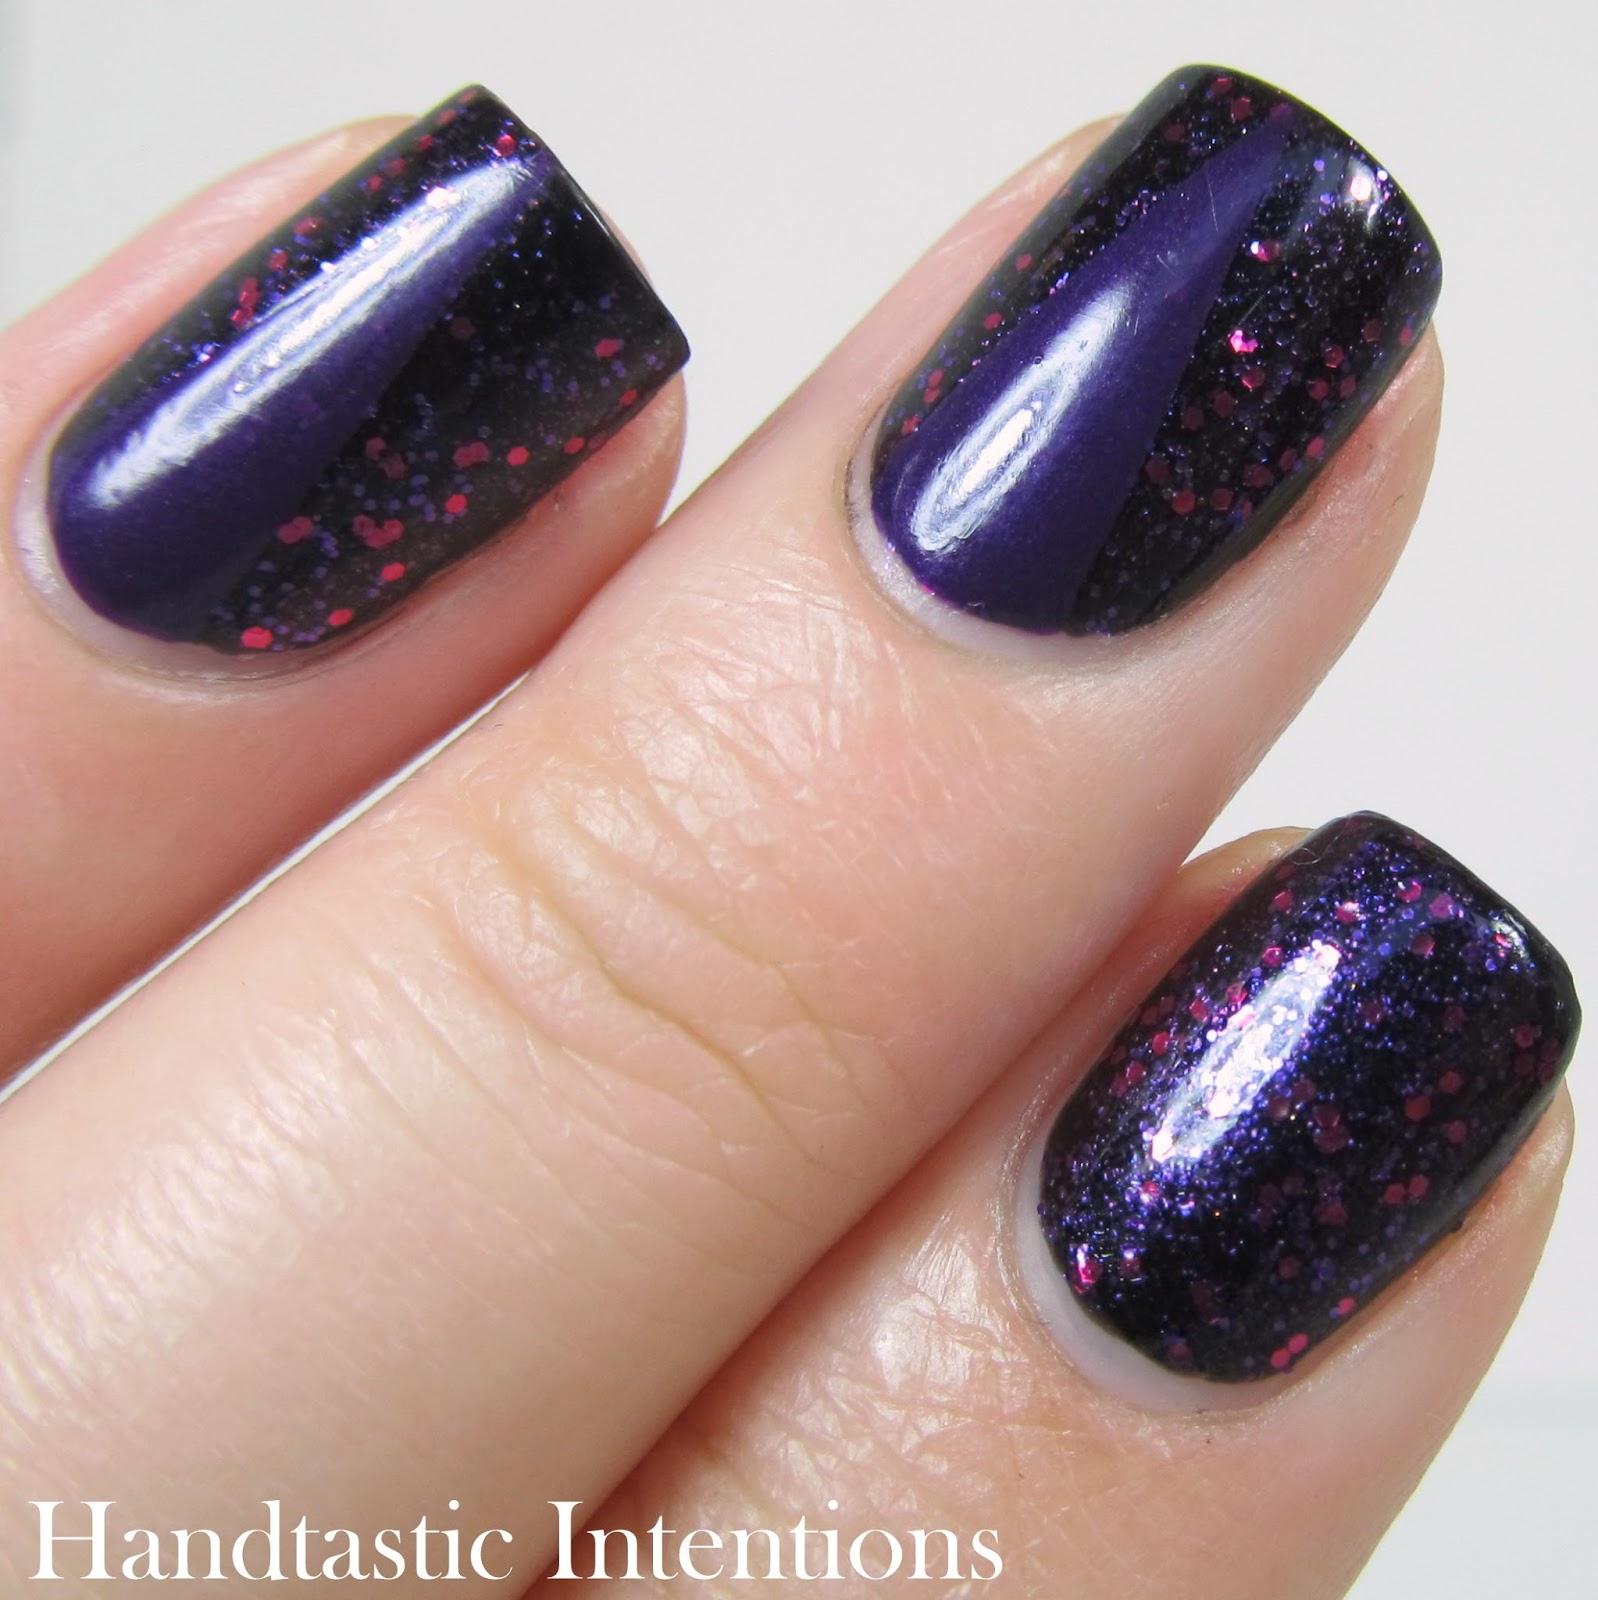 Handtastic Intentions: Dark Purple Nail Art